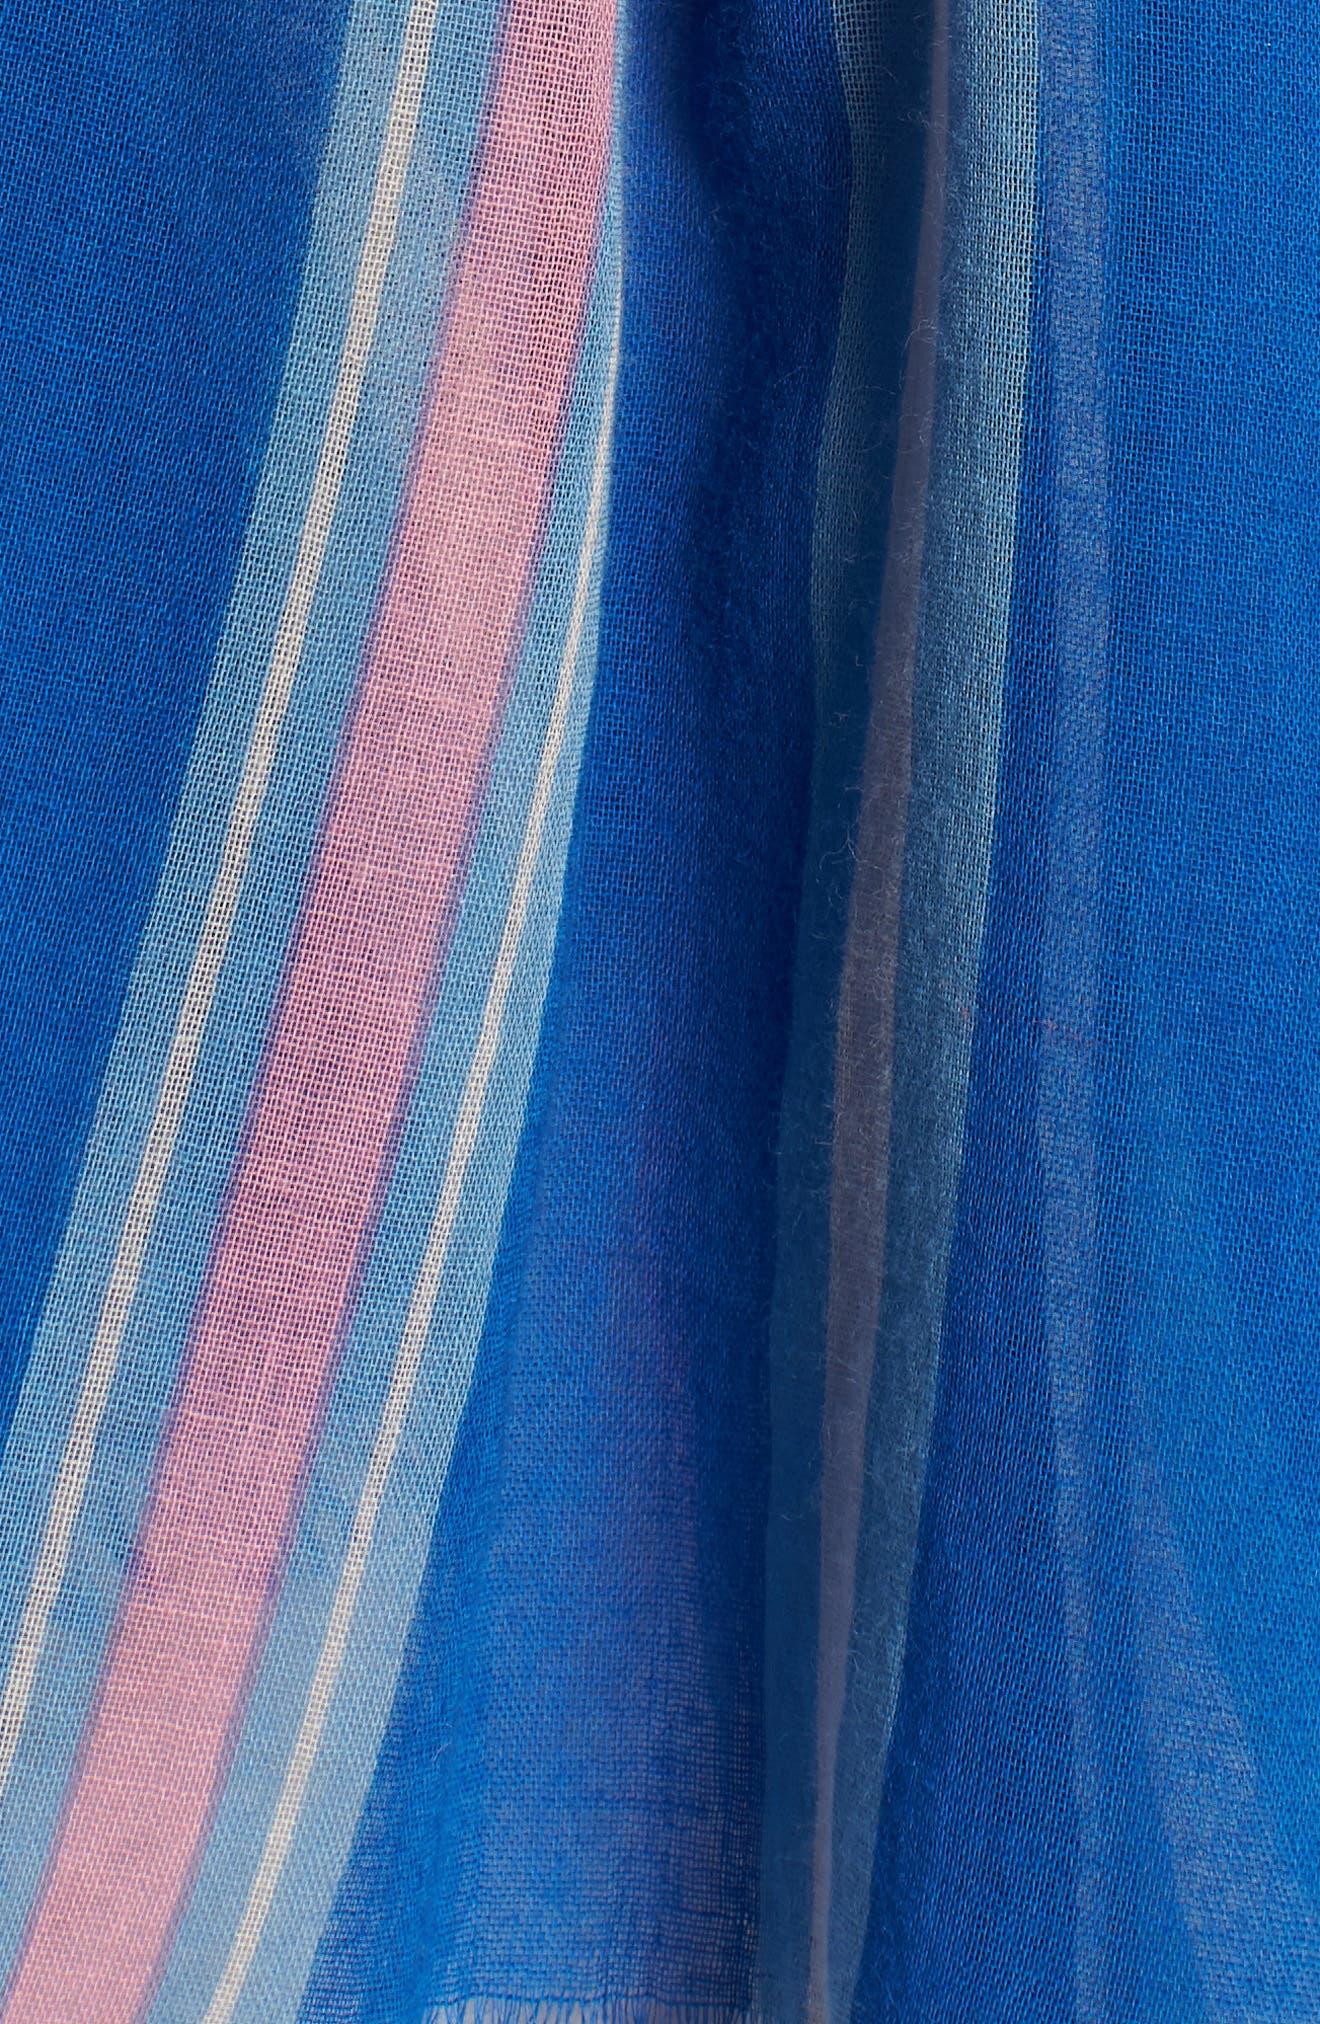 Stripe Sarong,                             Alternate thumbnail 5, color,                             900